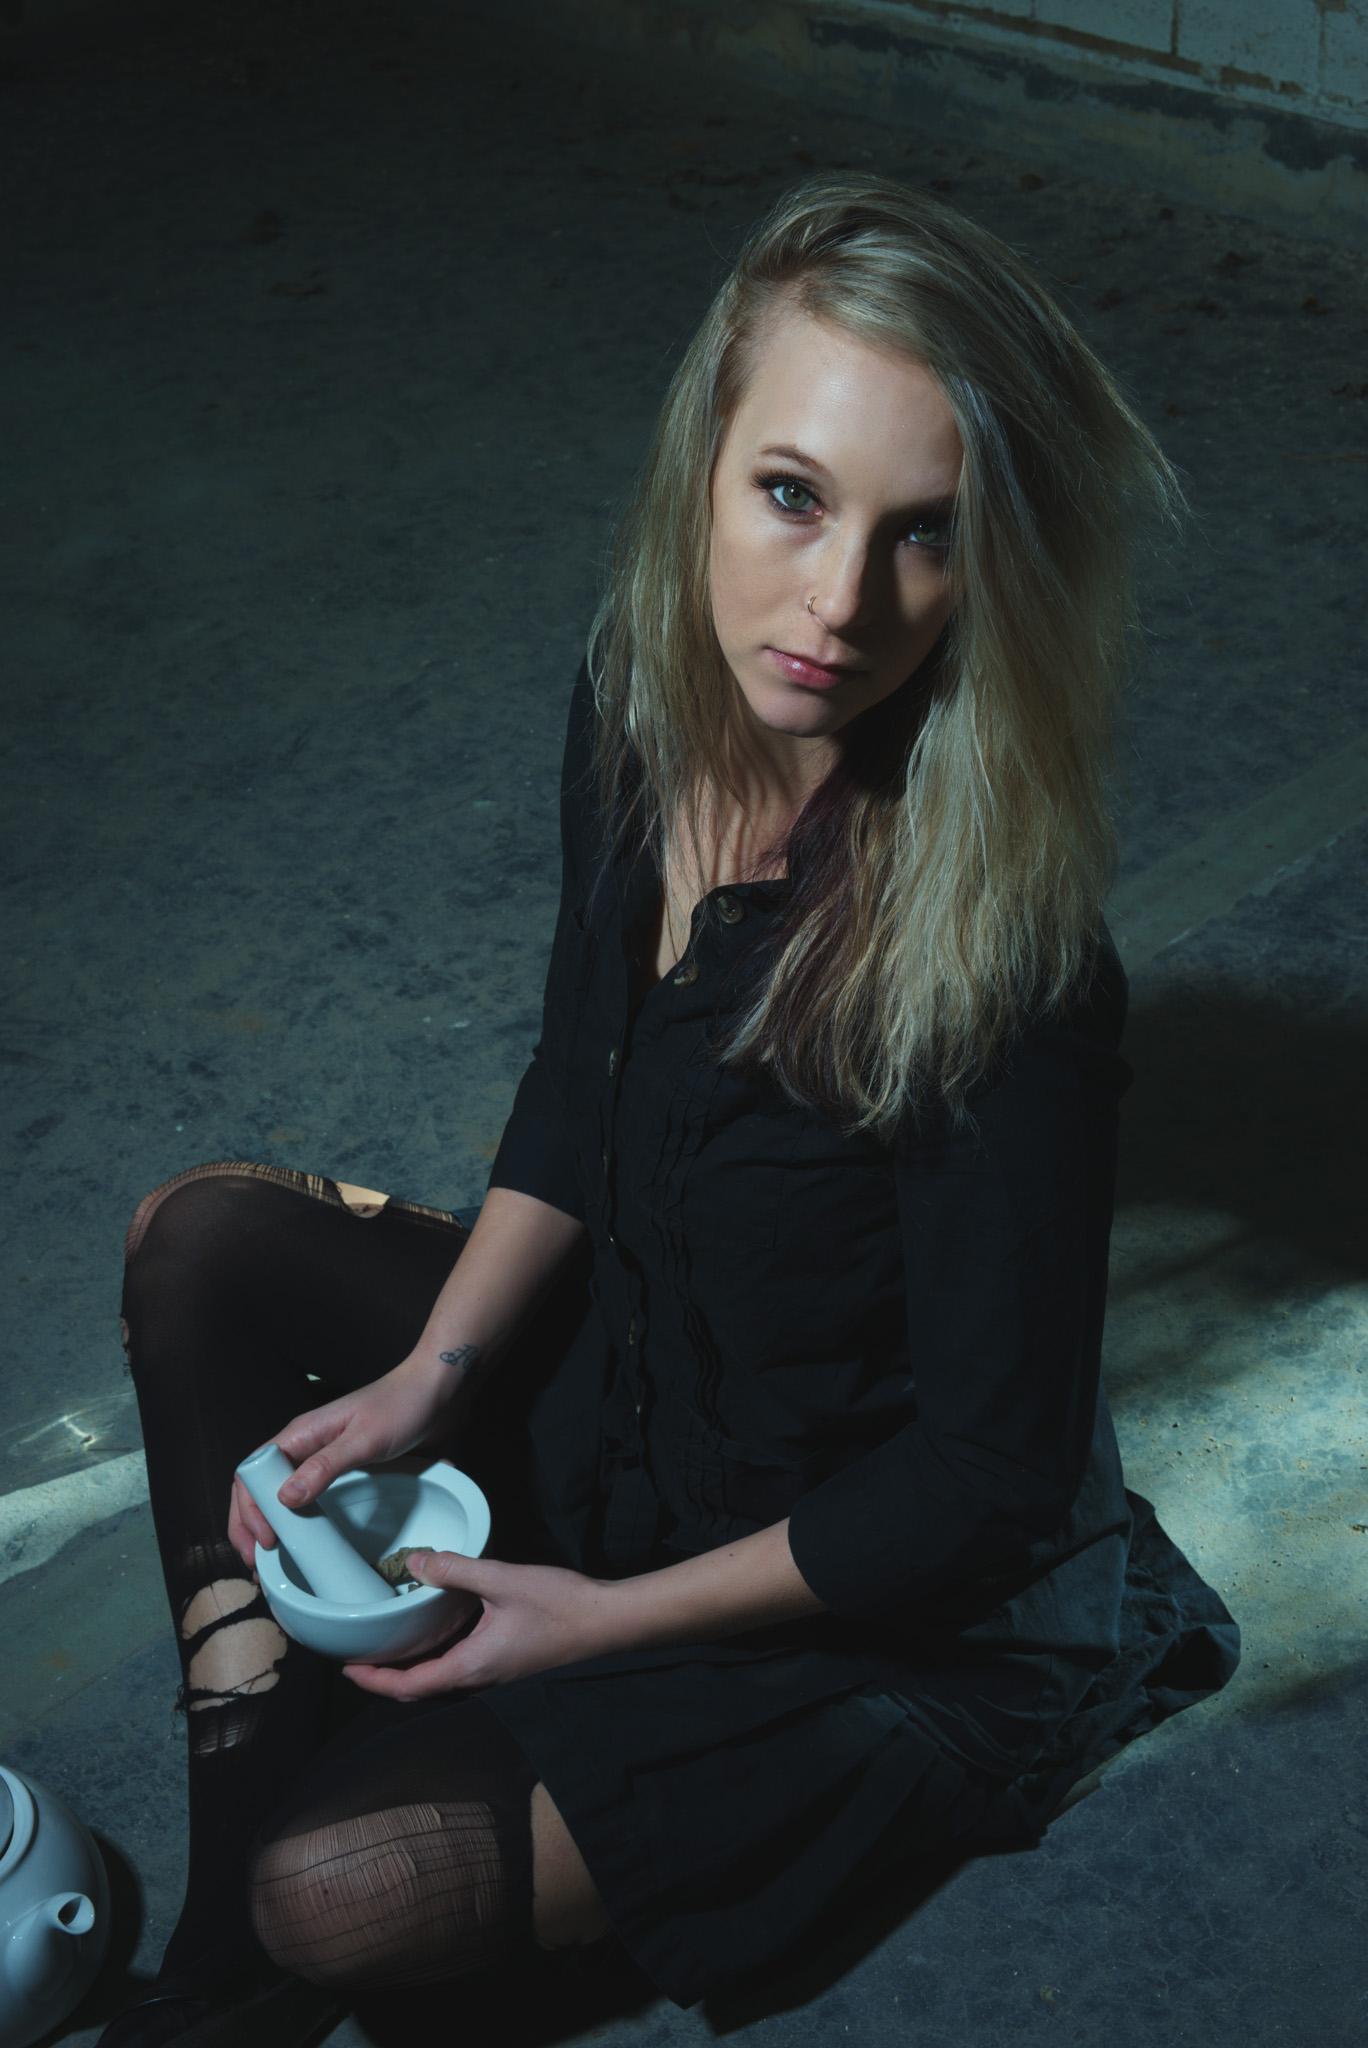 Model: Nicolette Grenier  Cameras used: Sony A7  Lens:Sonnar T* FE 55mm F1.8 Z